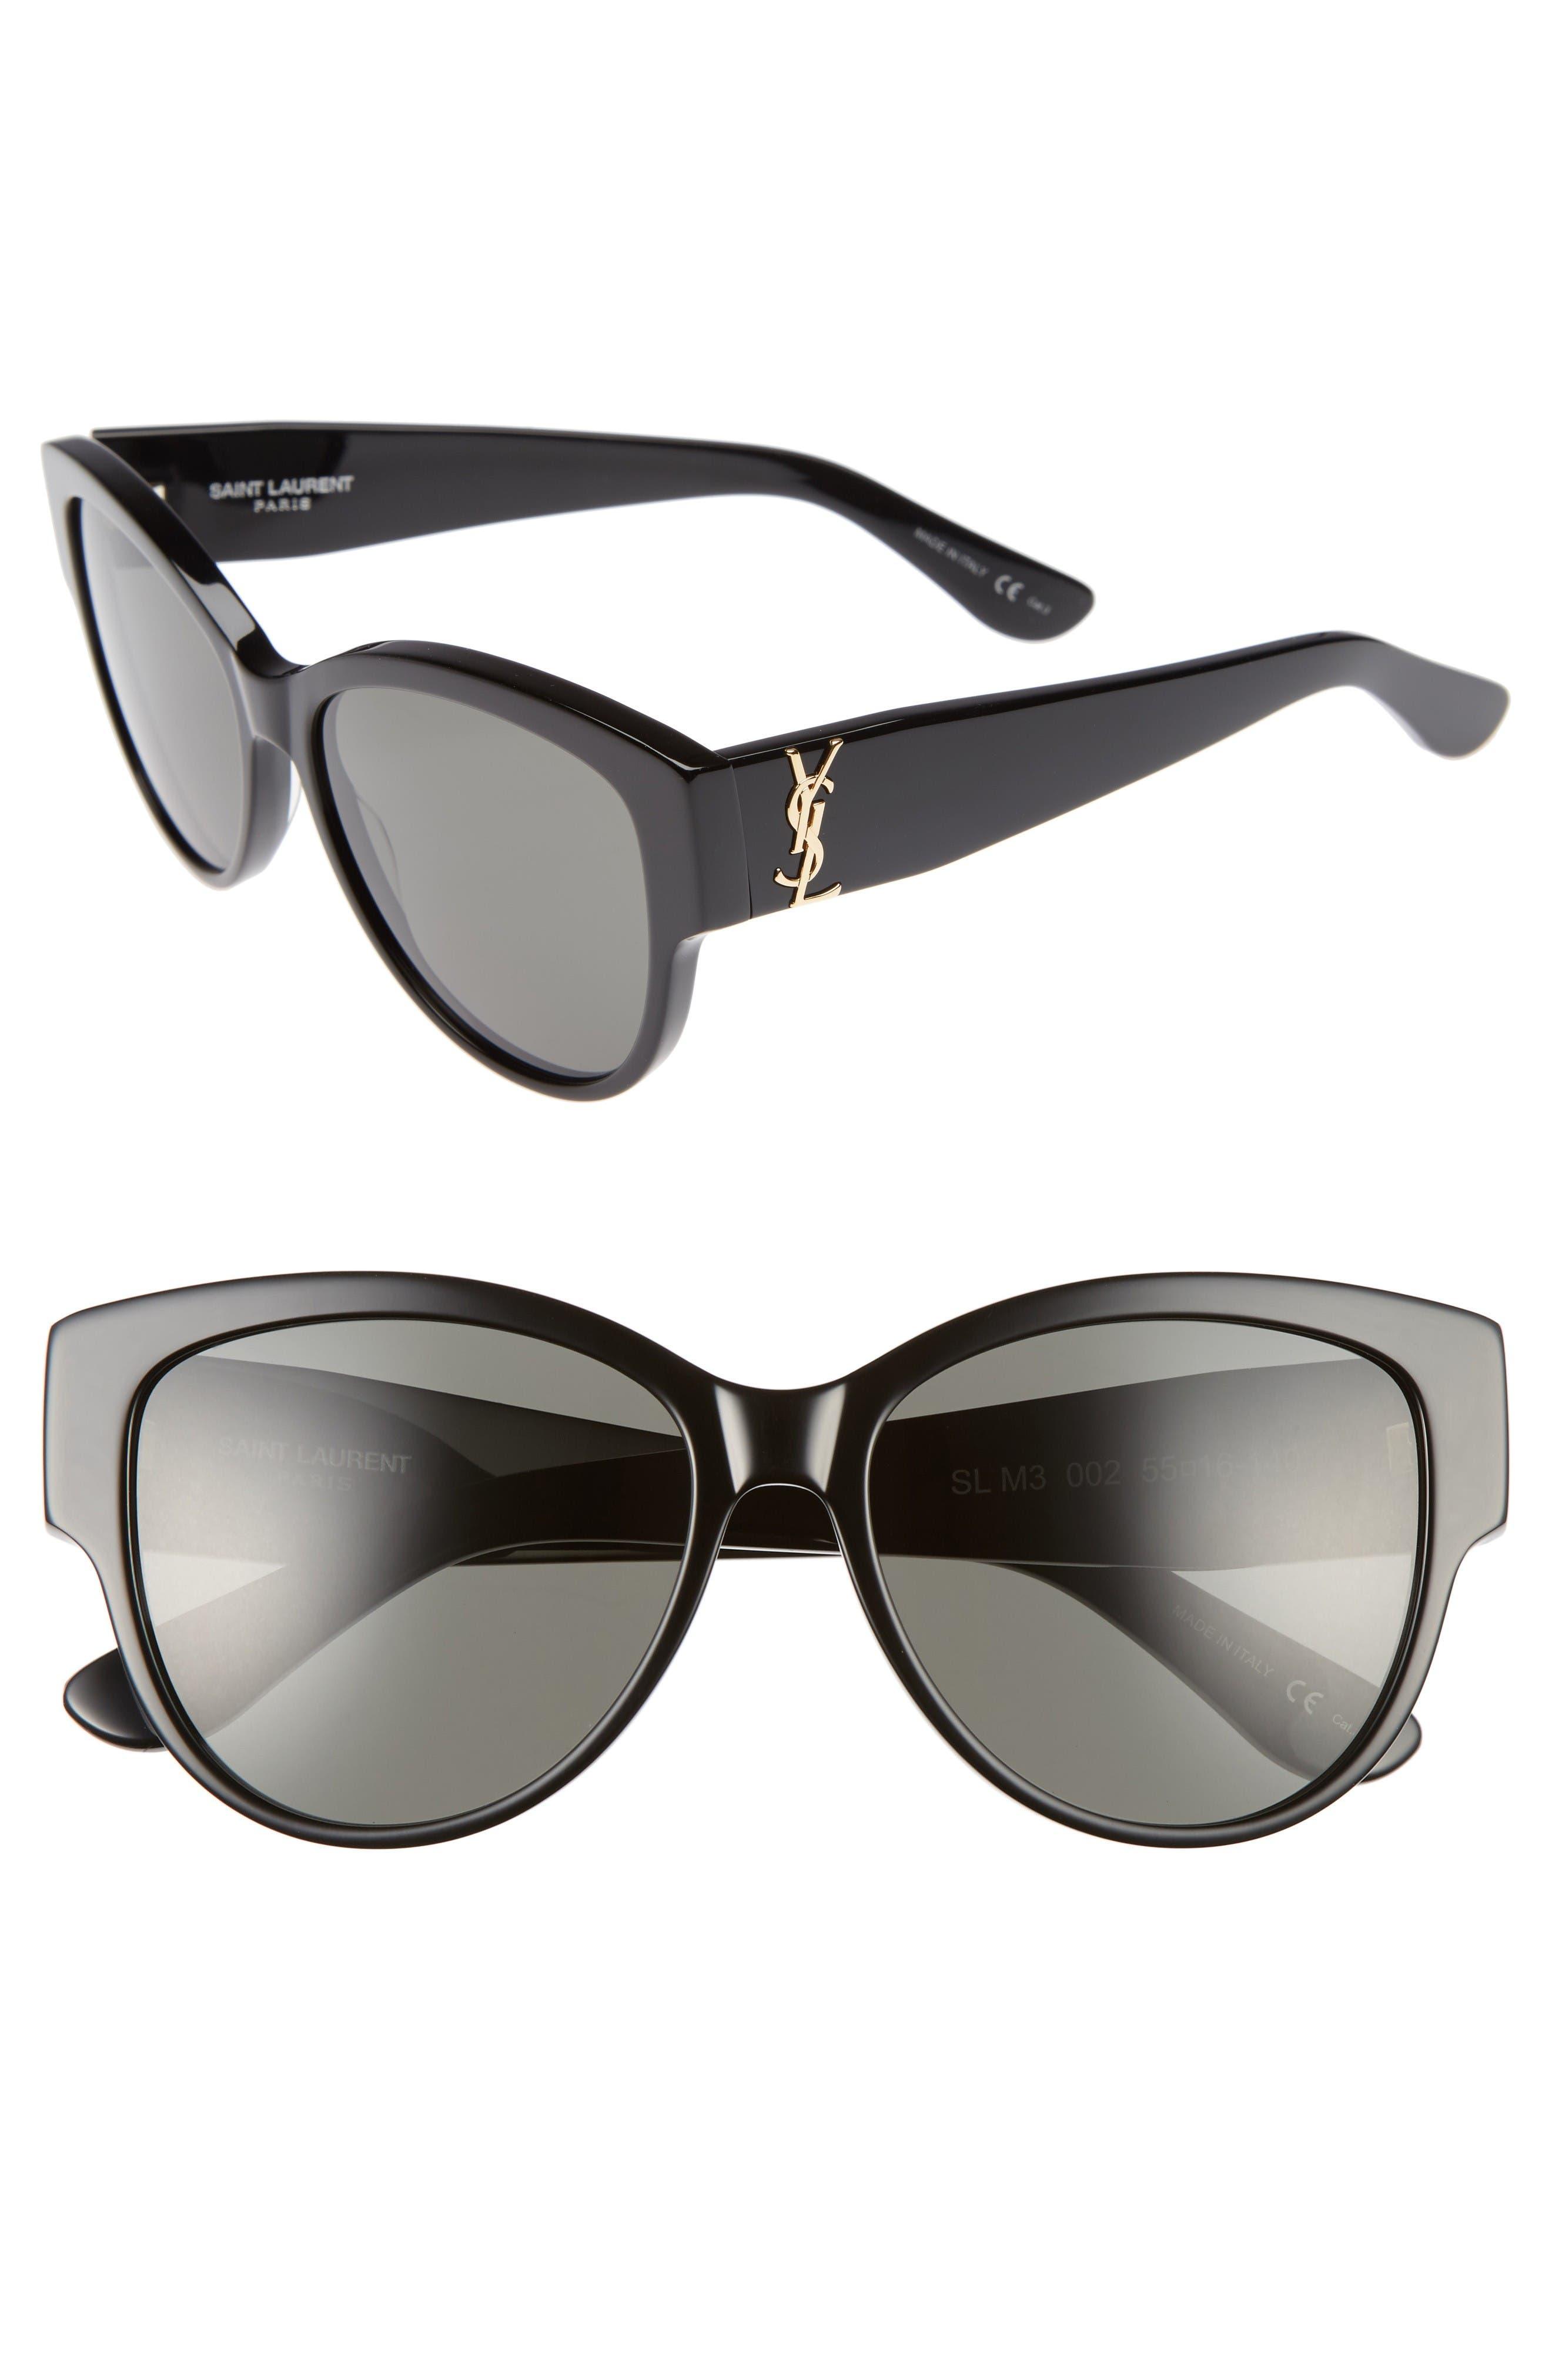 41cacfb53219 Saint Laurent Sunglasses